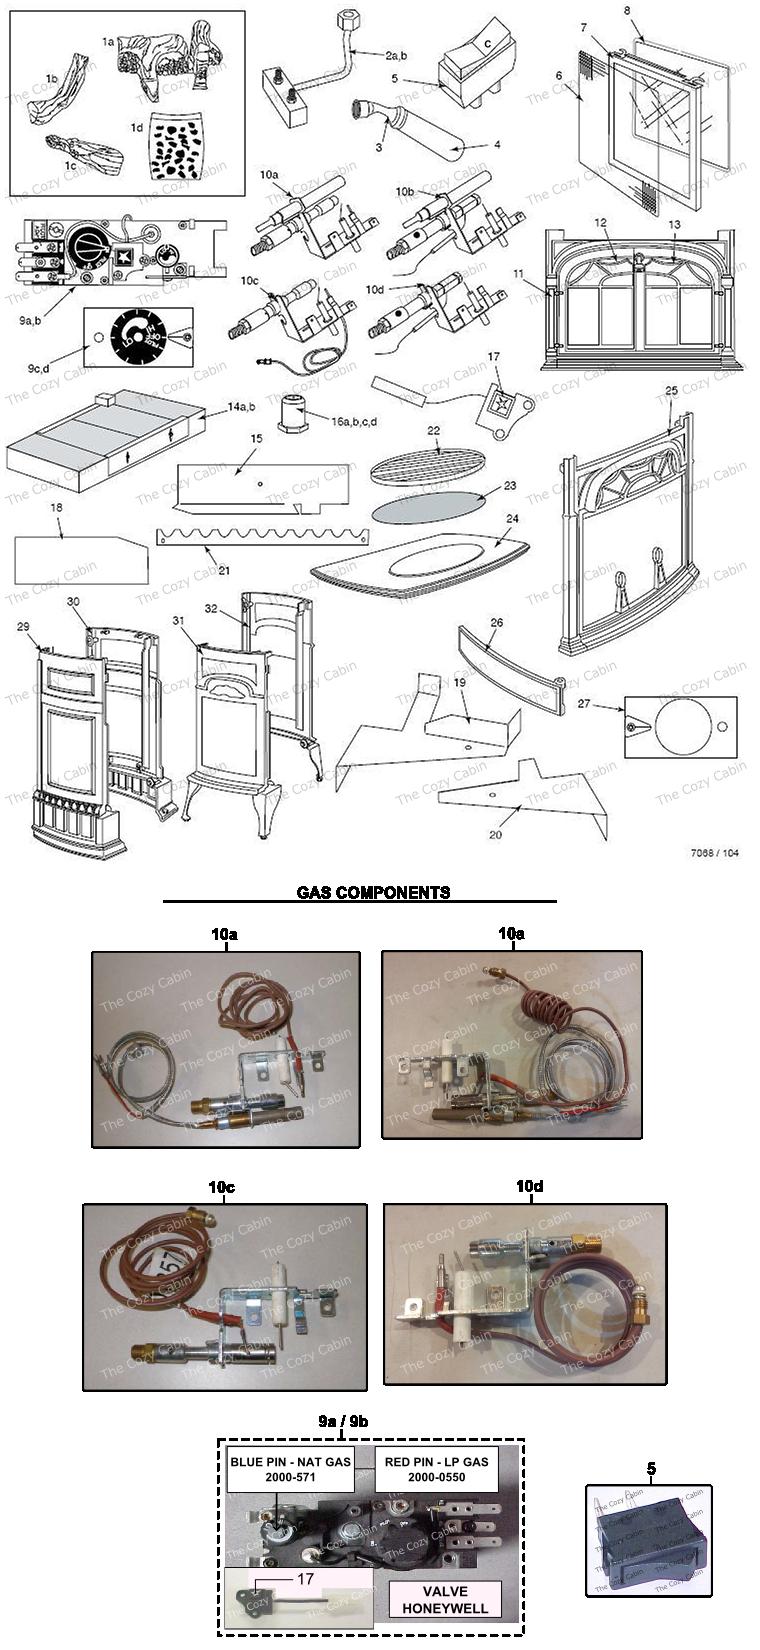 UVS27R / M Stardance & Pinnacle Vent Free Complete Units (Fireboxes 4030-4039, 4040-4049, 4085-4087, 4090-4092) #UVS27R-M2